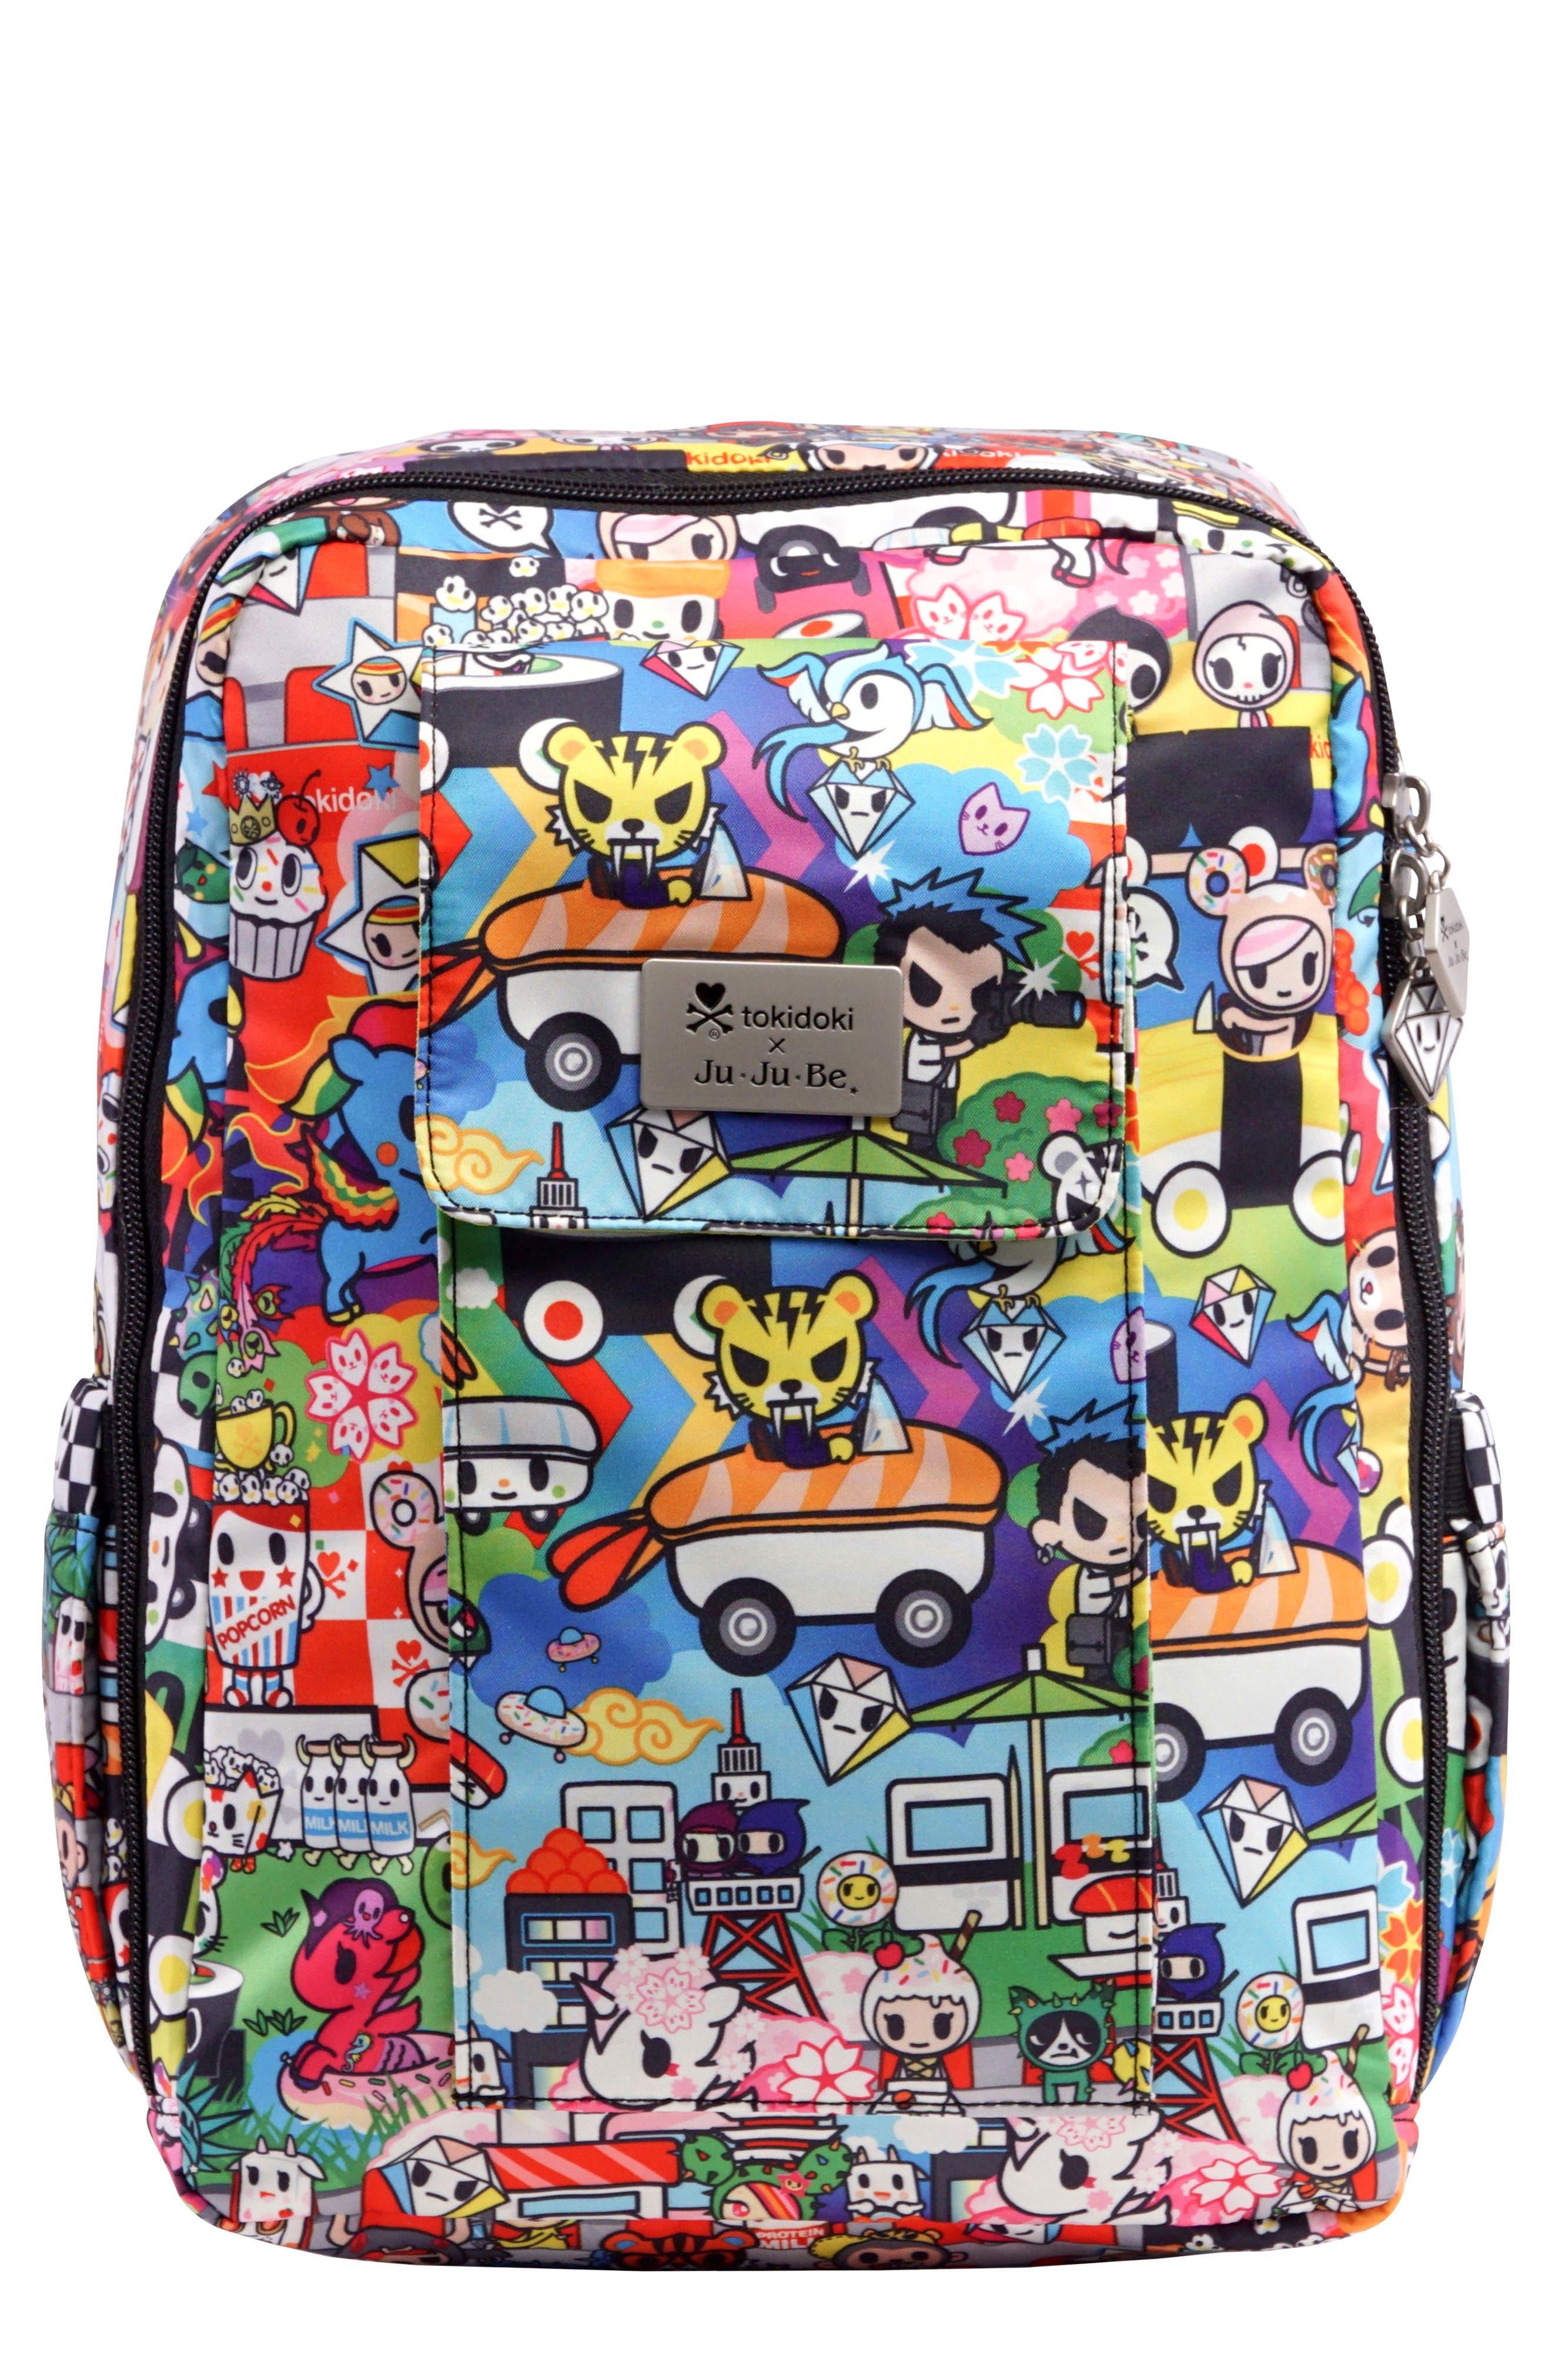 Alternate Image 1 Selected - tokidoki x Ju-Ju-Be 'Mini Be' Backpack